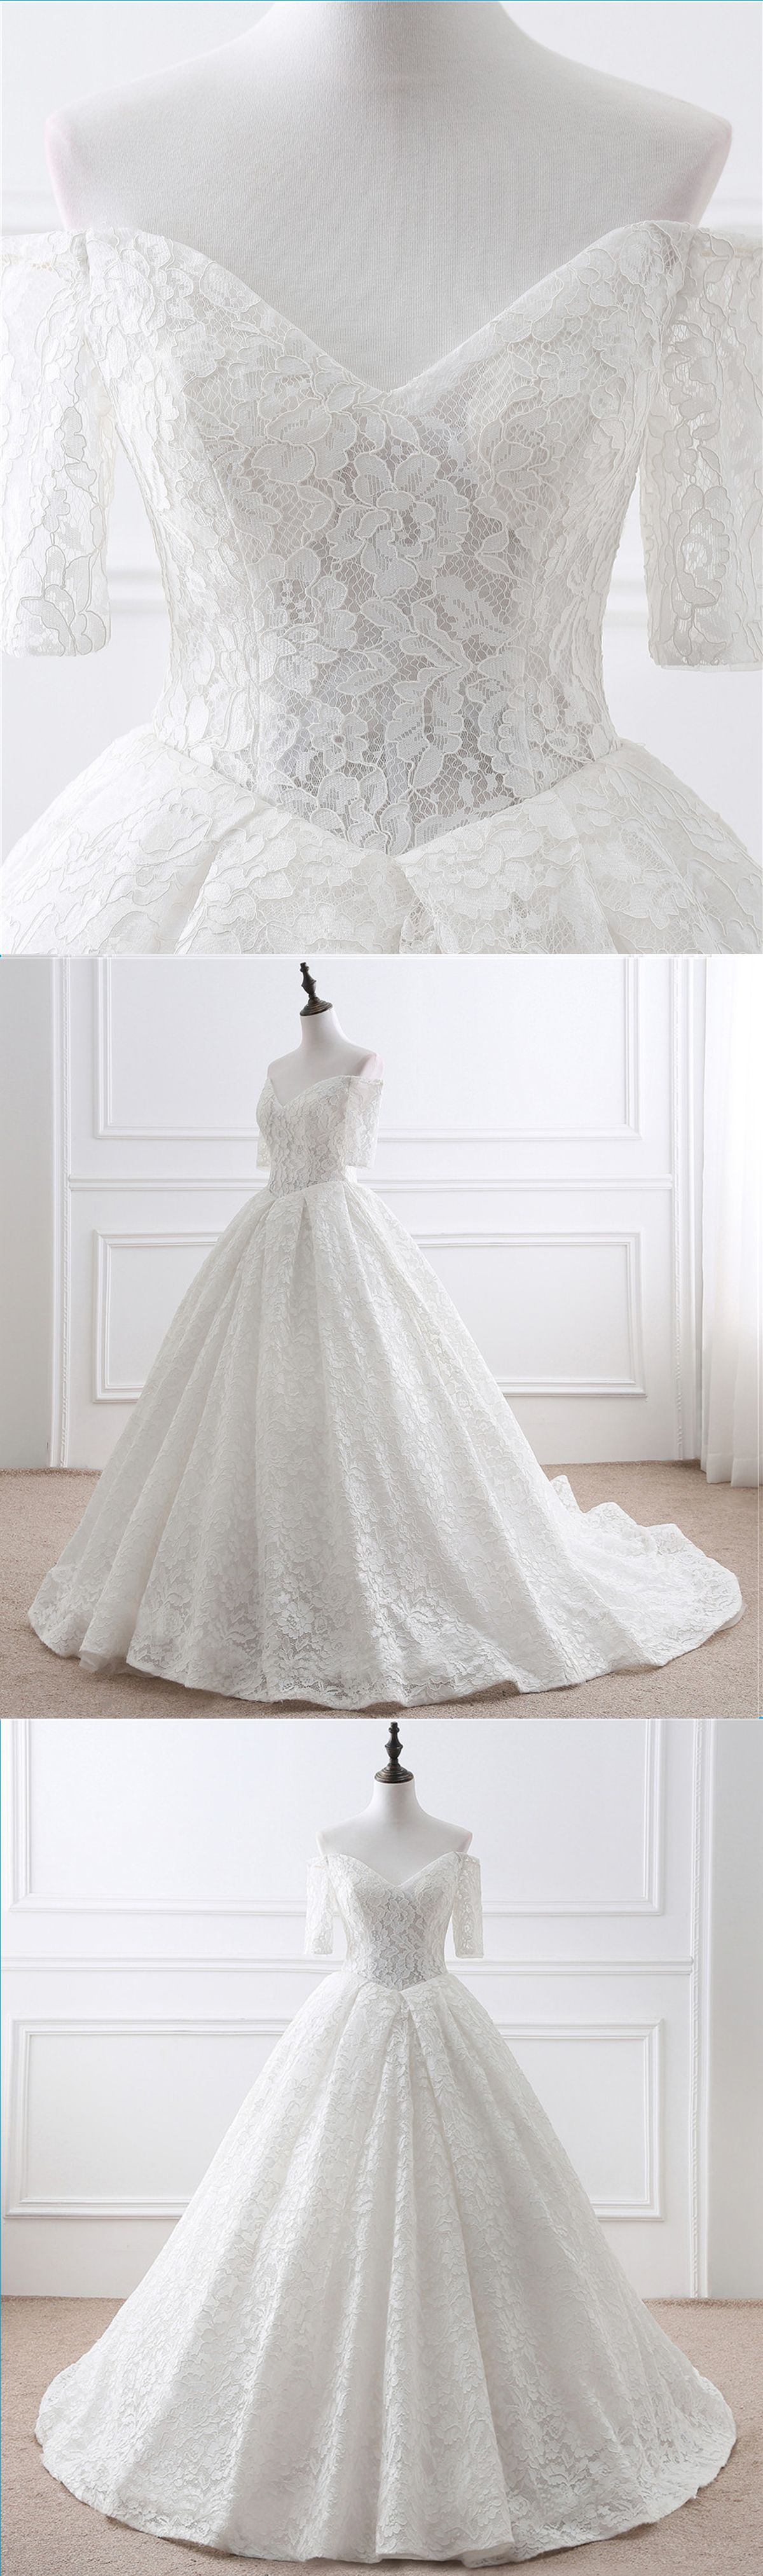 Gorgeous white lace mid sleeve off shoulder long customize wedding